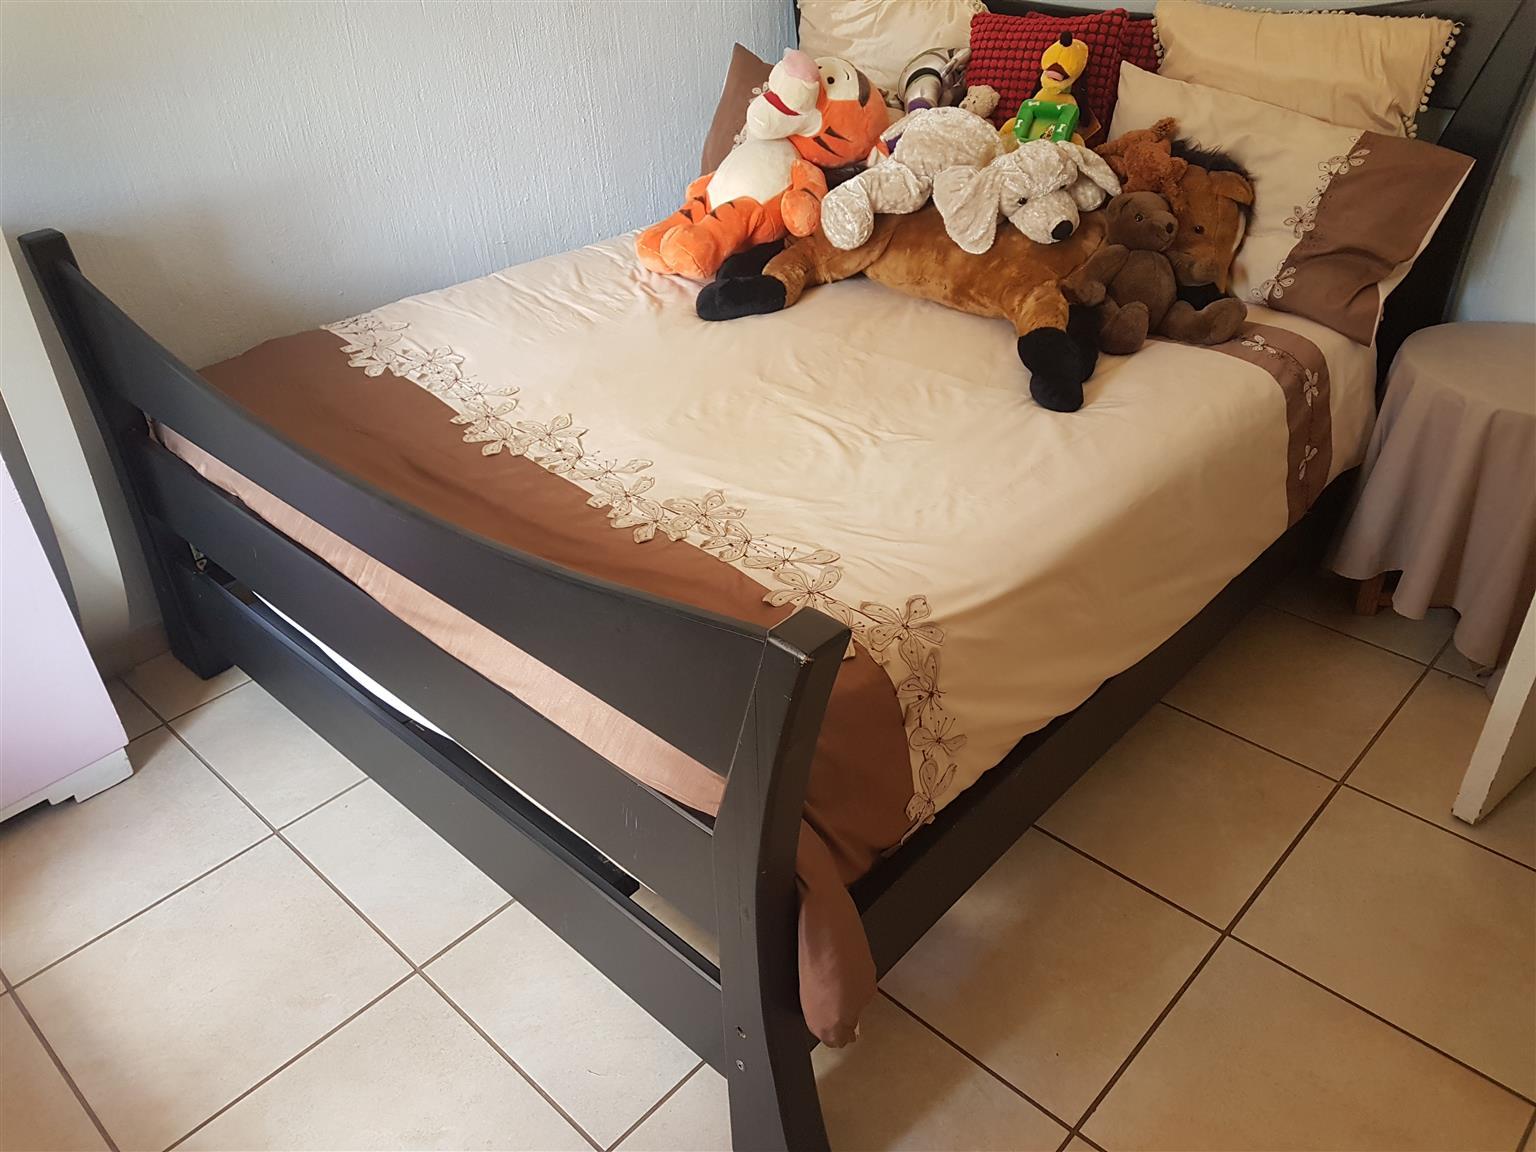 Queen Size Bed for sale + Mattress + Mattress protector